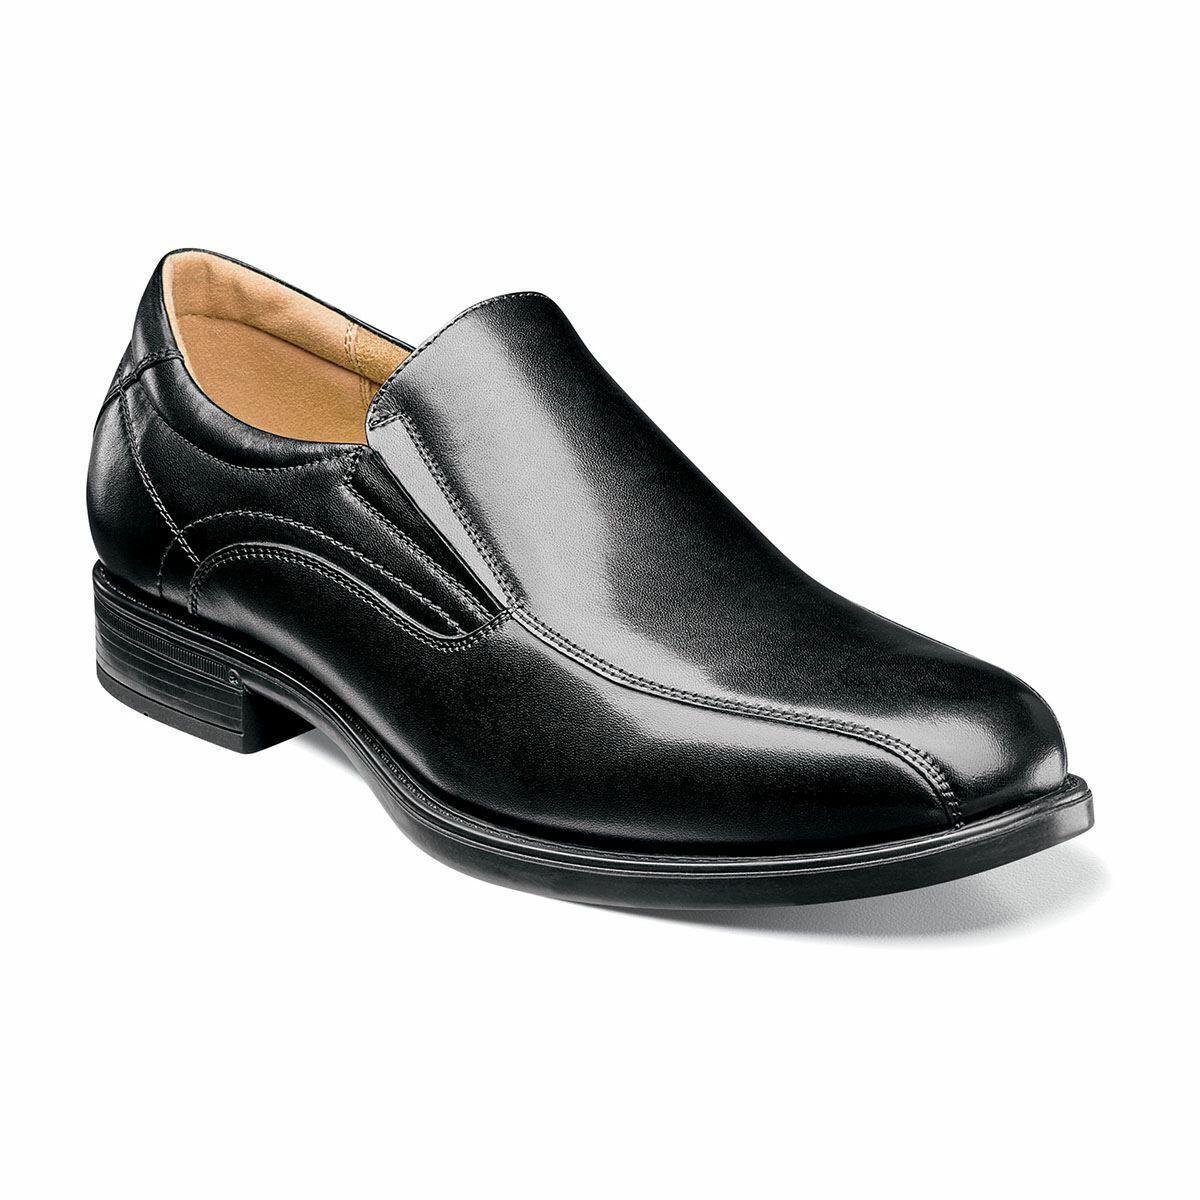 Florsheim Men's Men's Men's Midtown Bike Toe Loafers Leather shoes Black 12166-001 750bb1